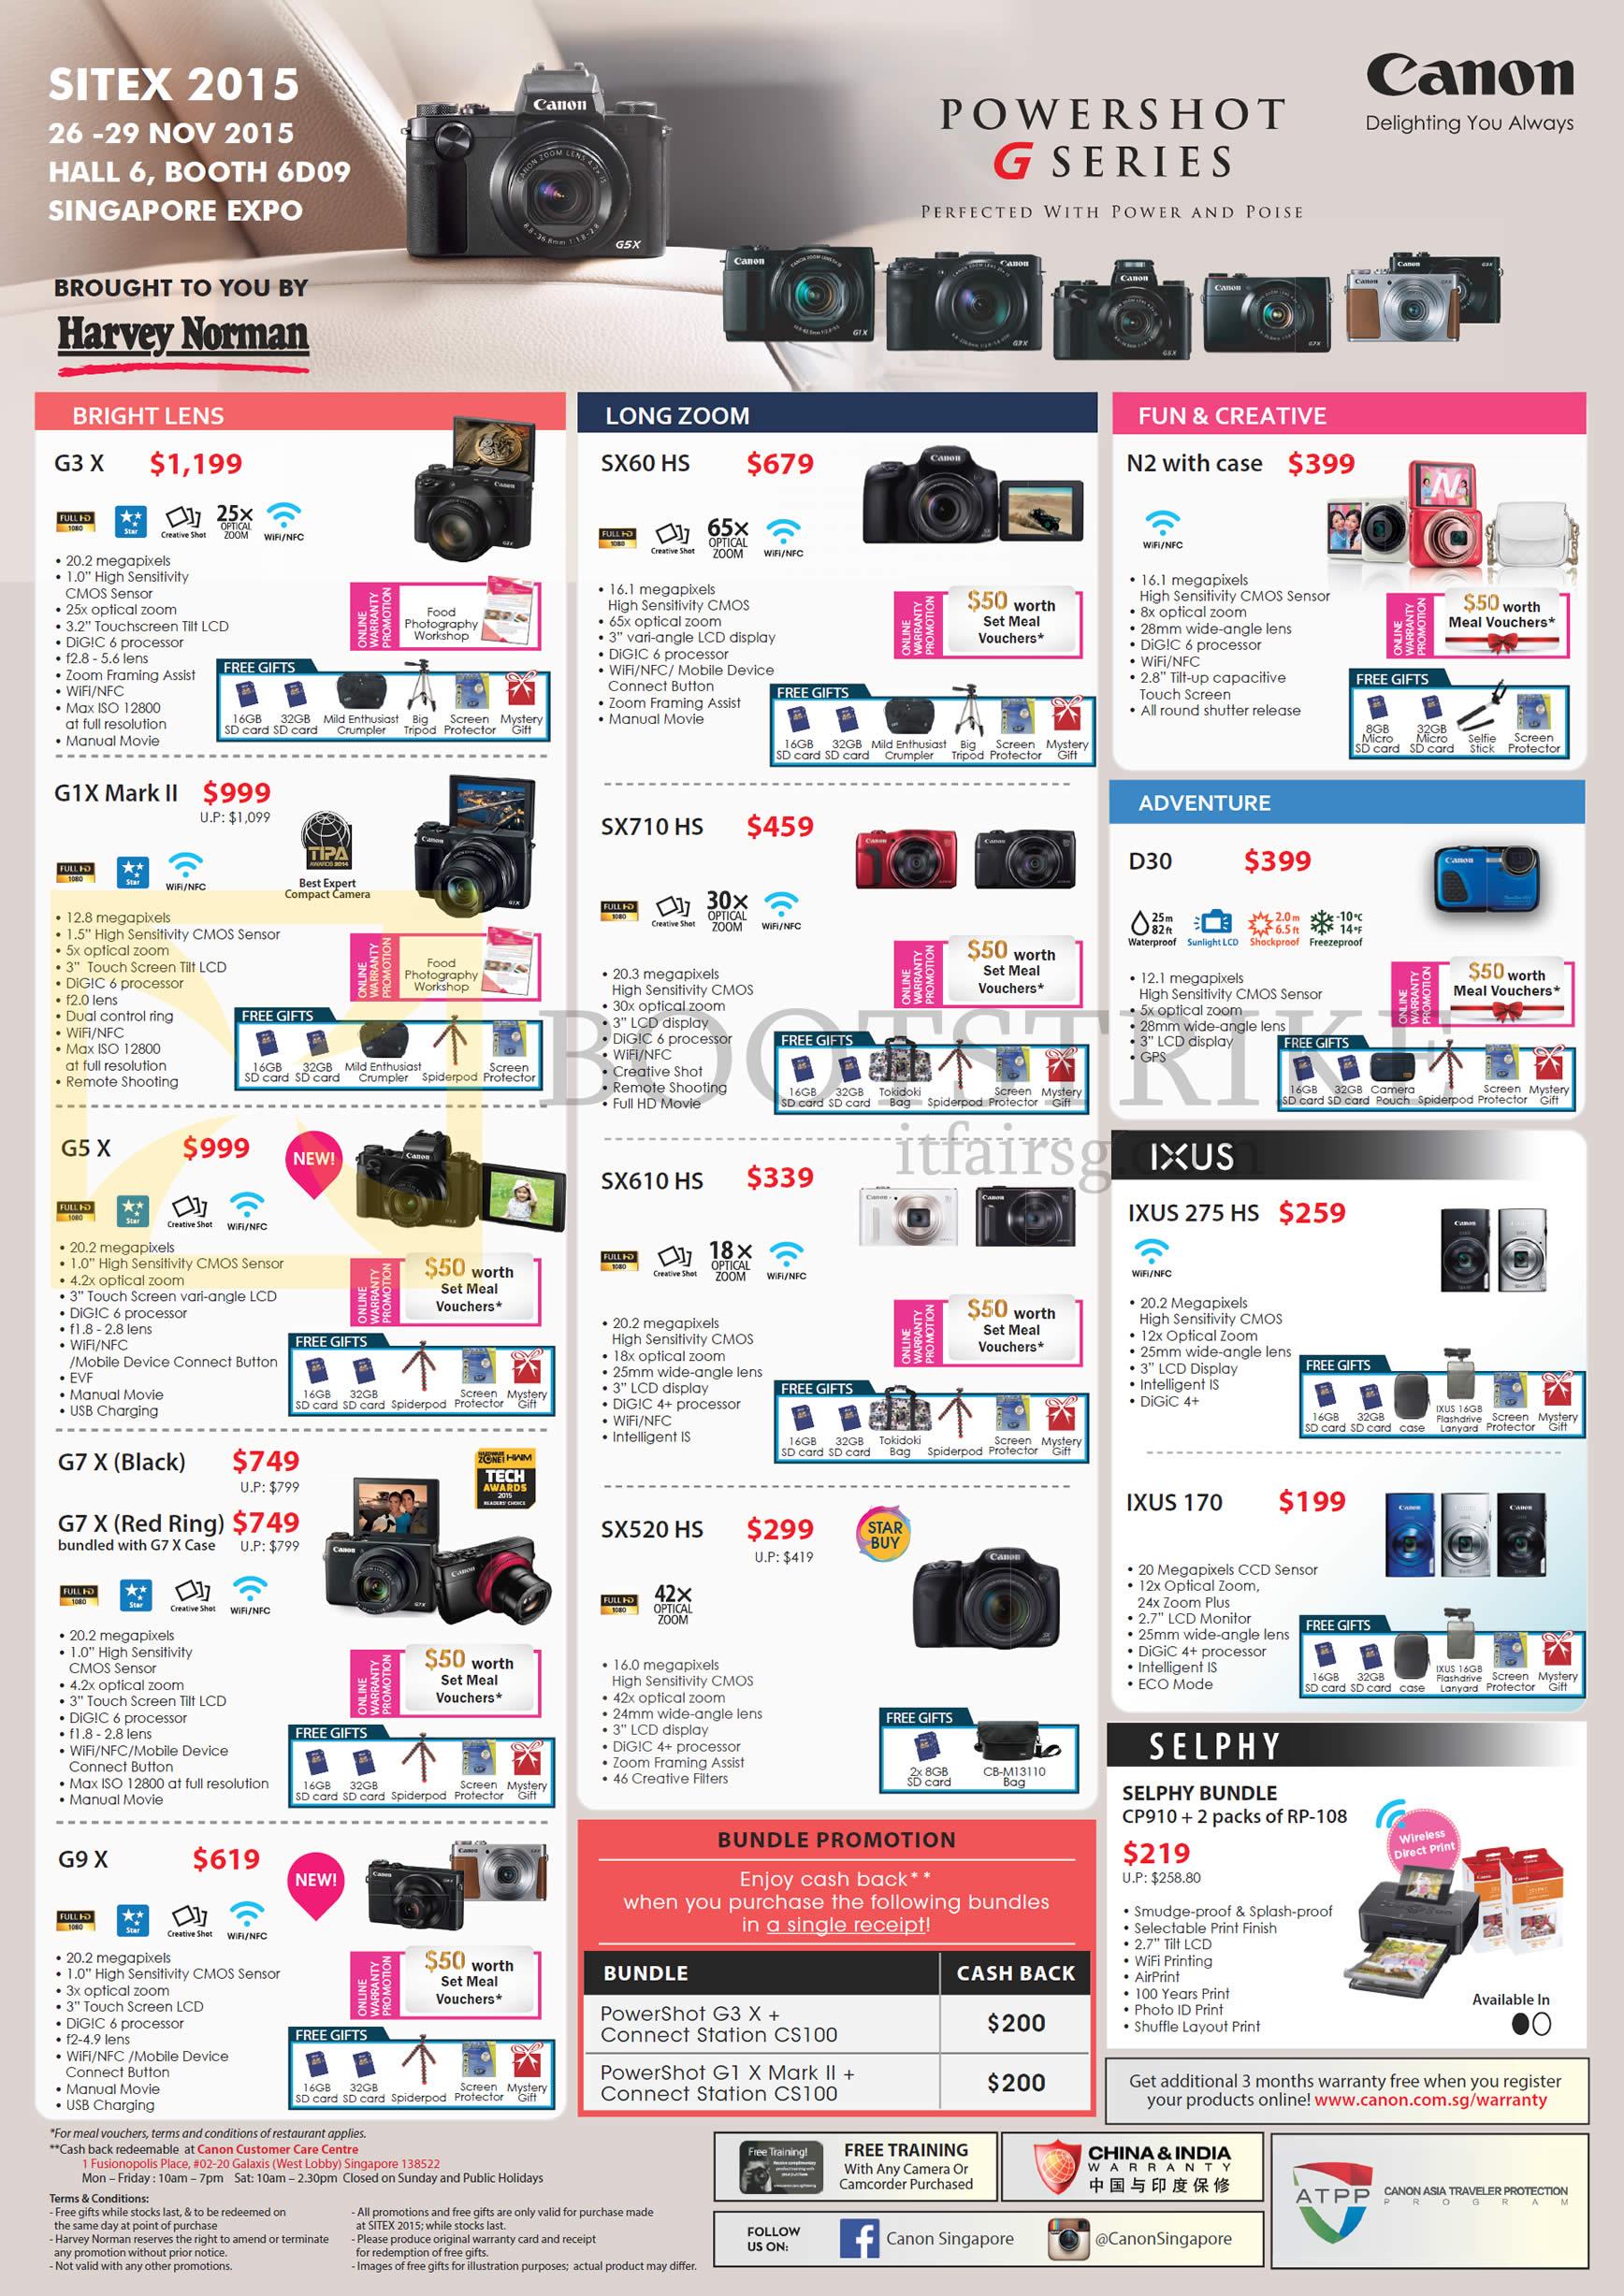 Canon Digital Cameras, G3 X, G1X Mark II, G5 X, G7 X, G9 X, Long Zoom, SX60 HS, SX710 HS, SX610 HS, SX520 HS, N2, D30, IXUS 275 HS, 170, Selphy Bundle